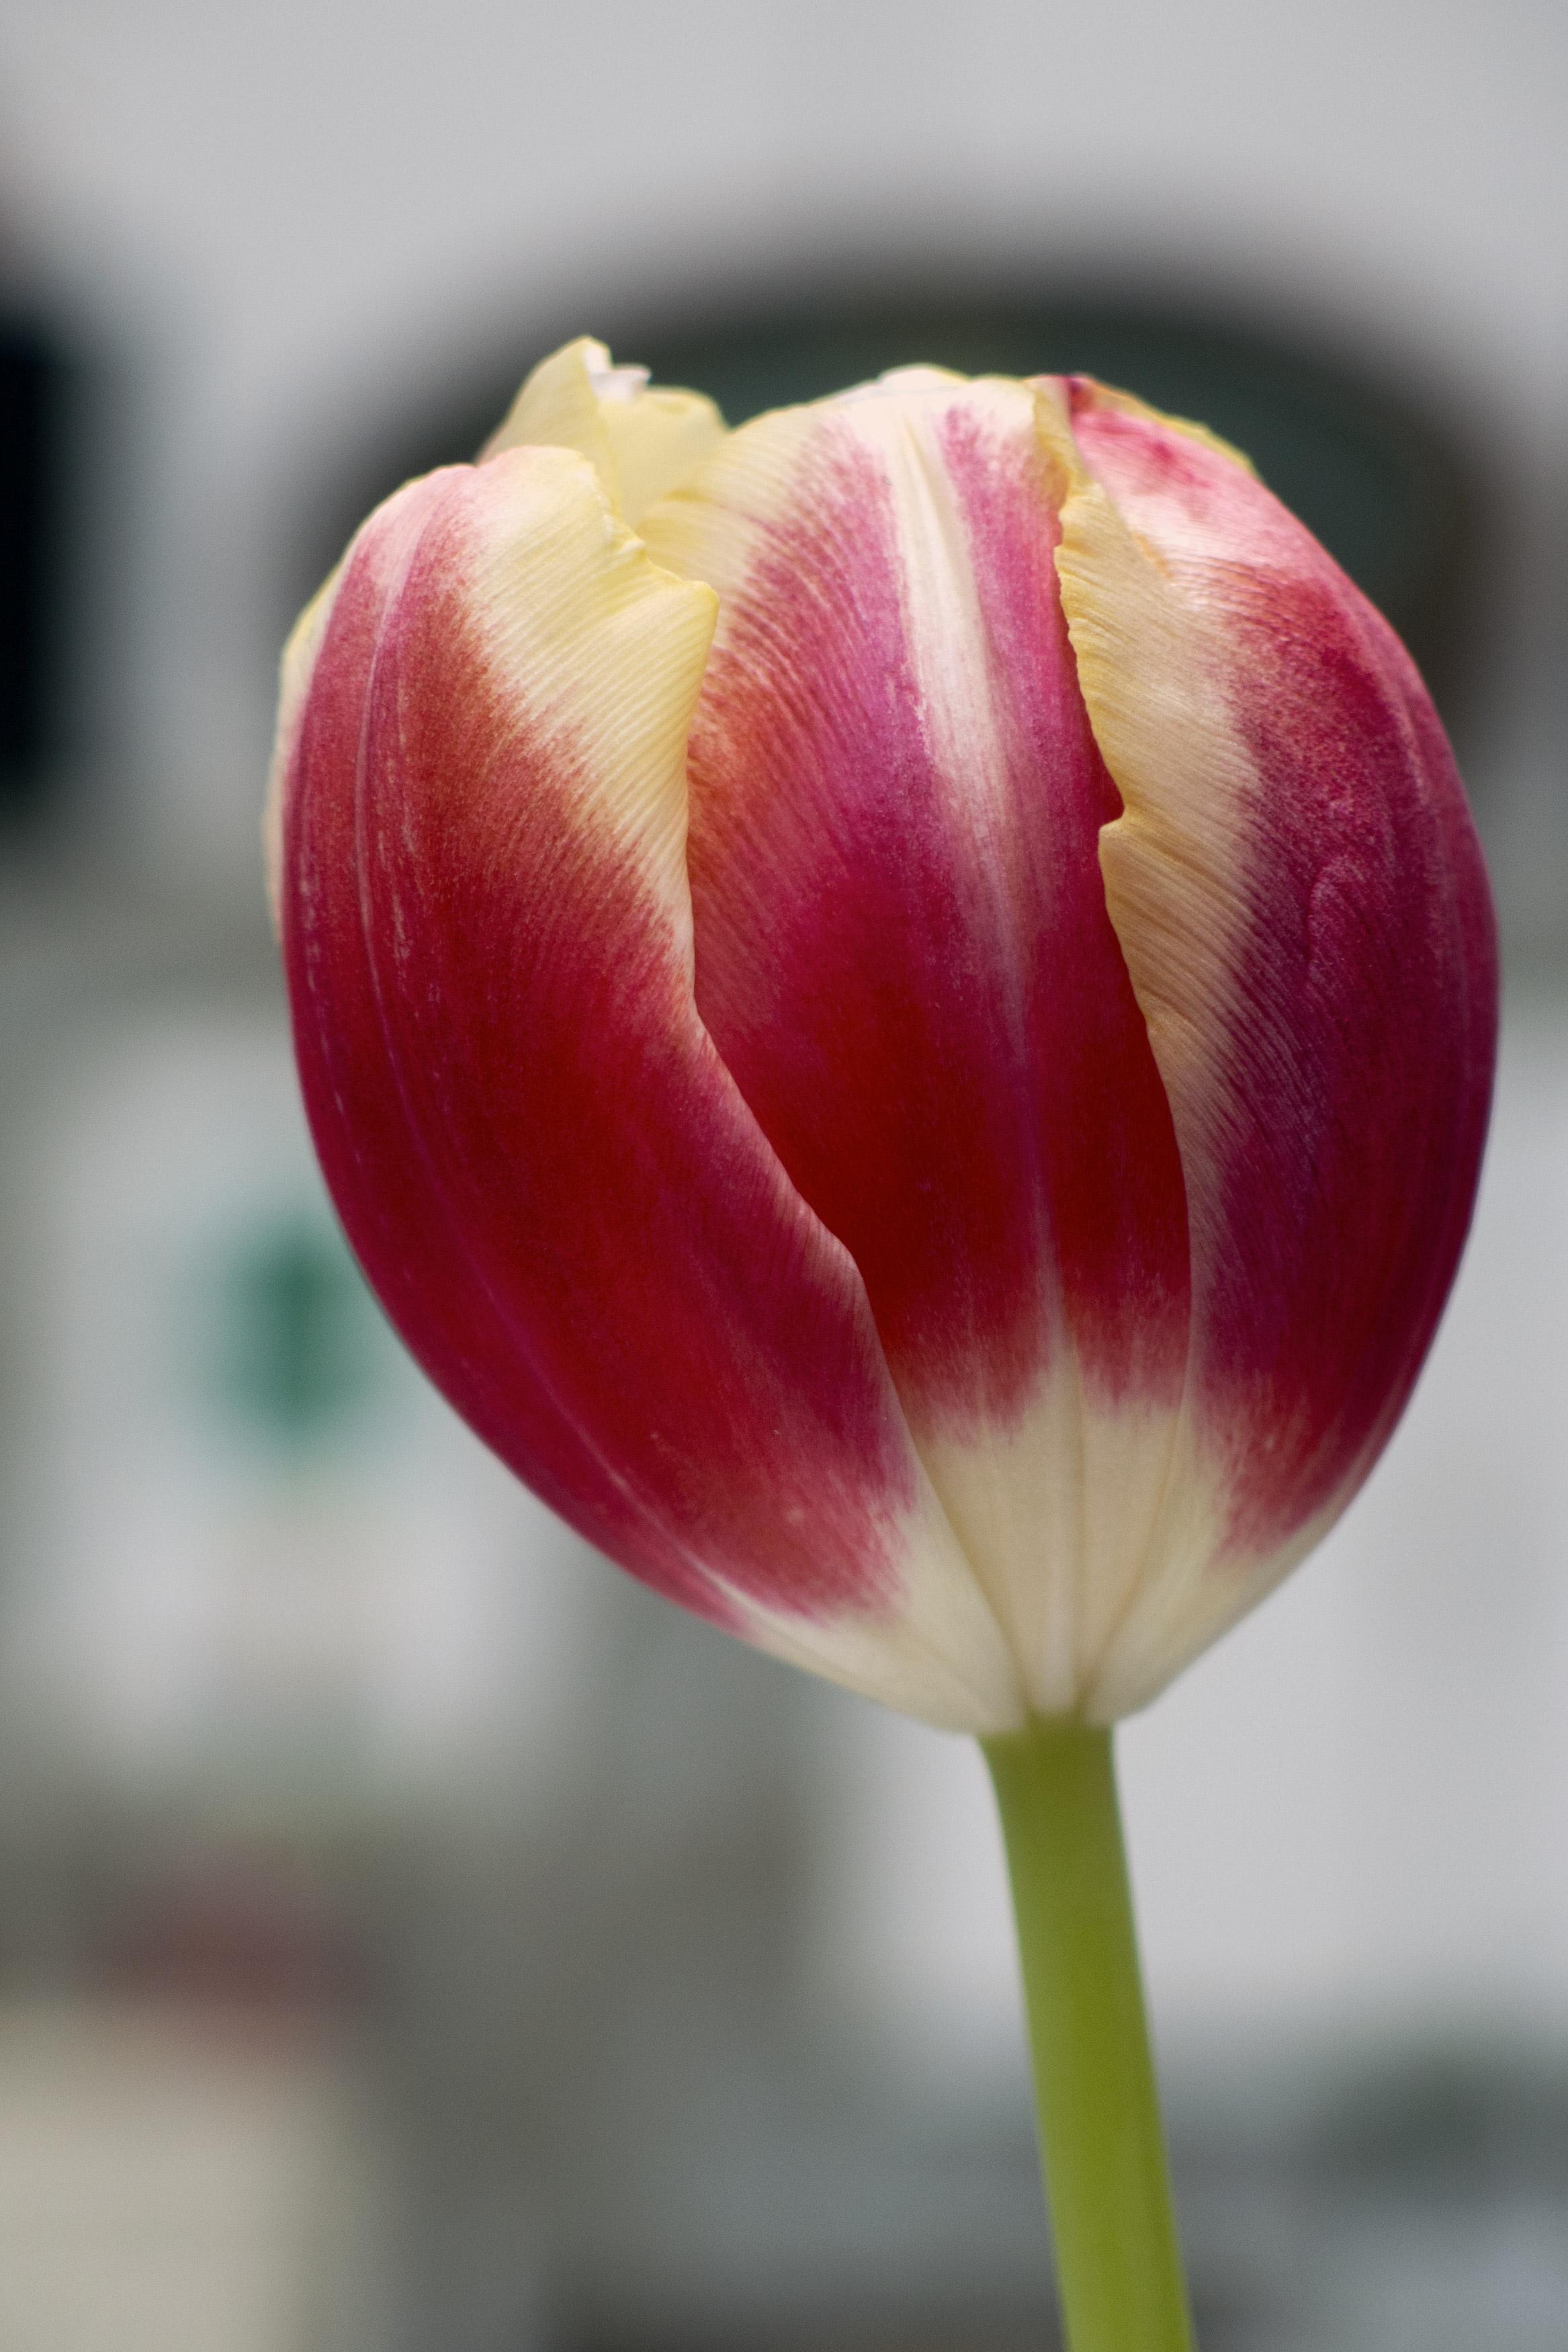 Free Image Tulip Flower Libreshot Public Domain Photos